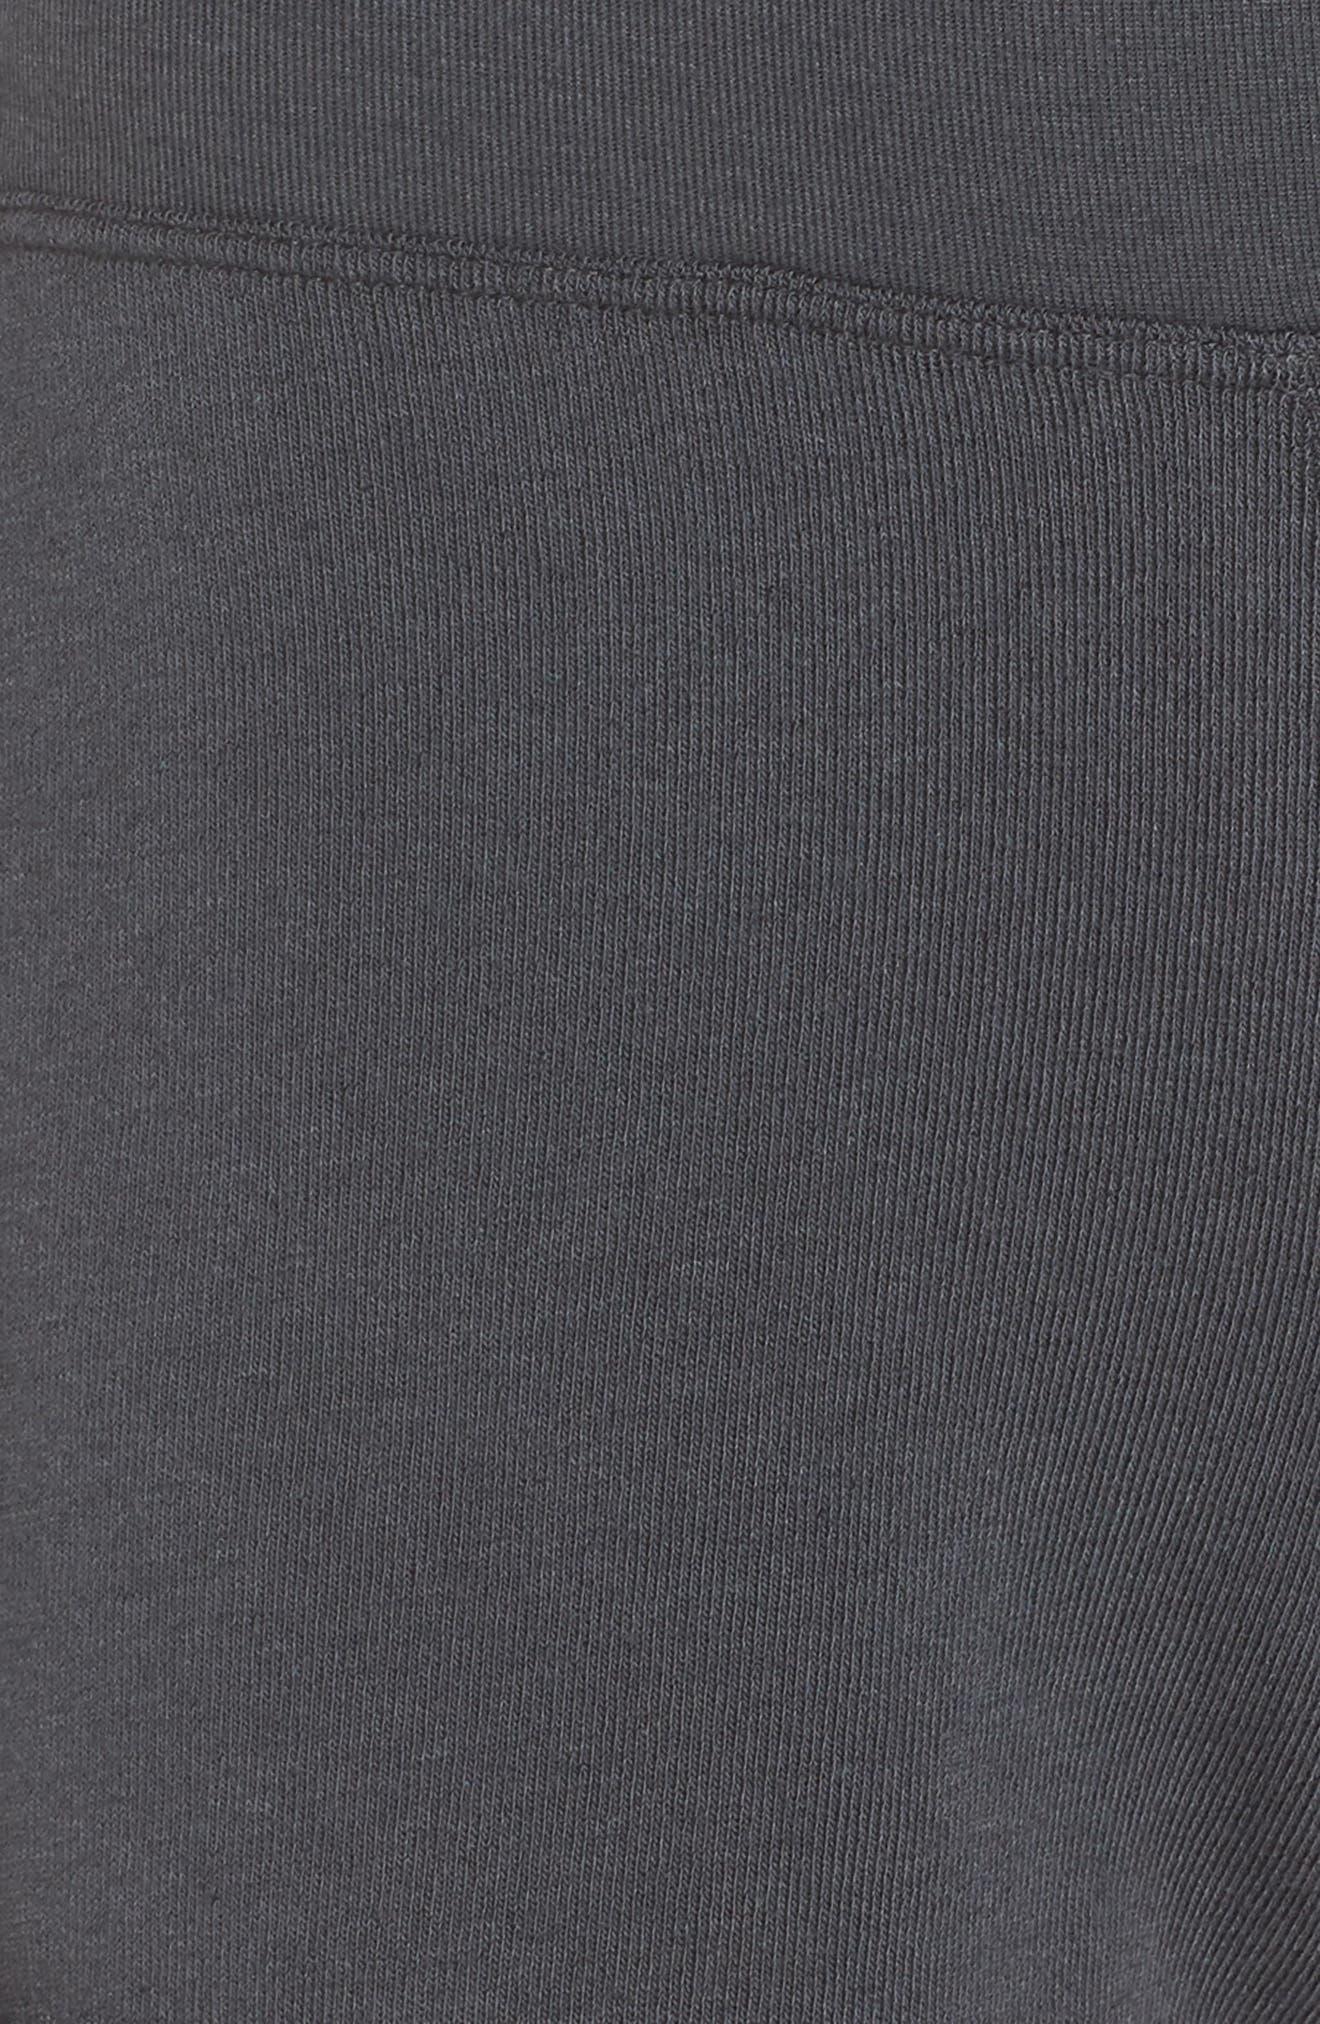 Boarder Shorts,                             Alternate thumbnail 11, color,